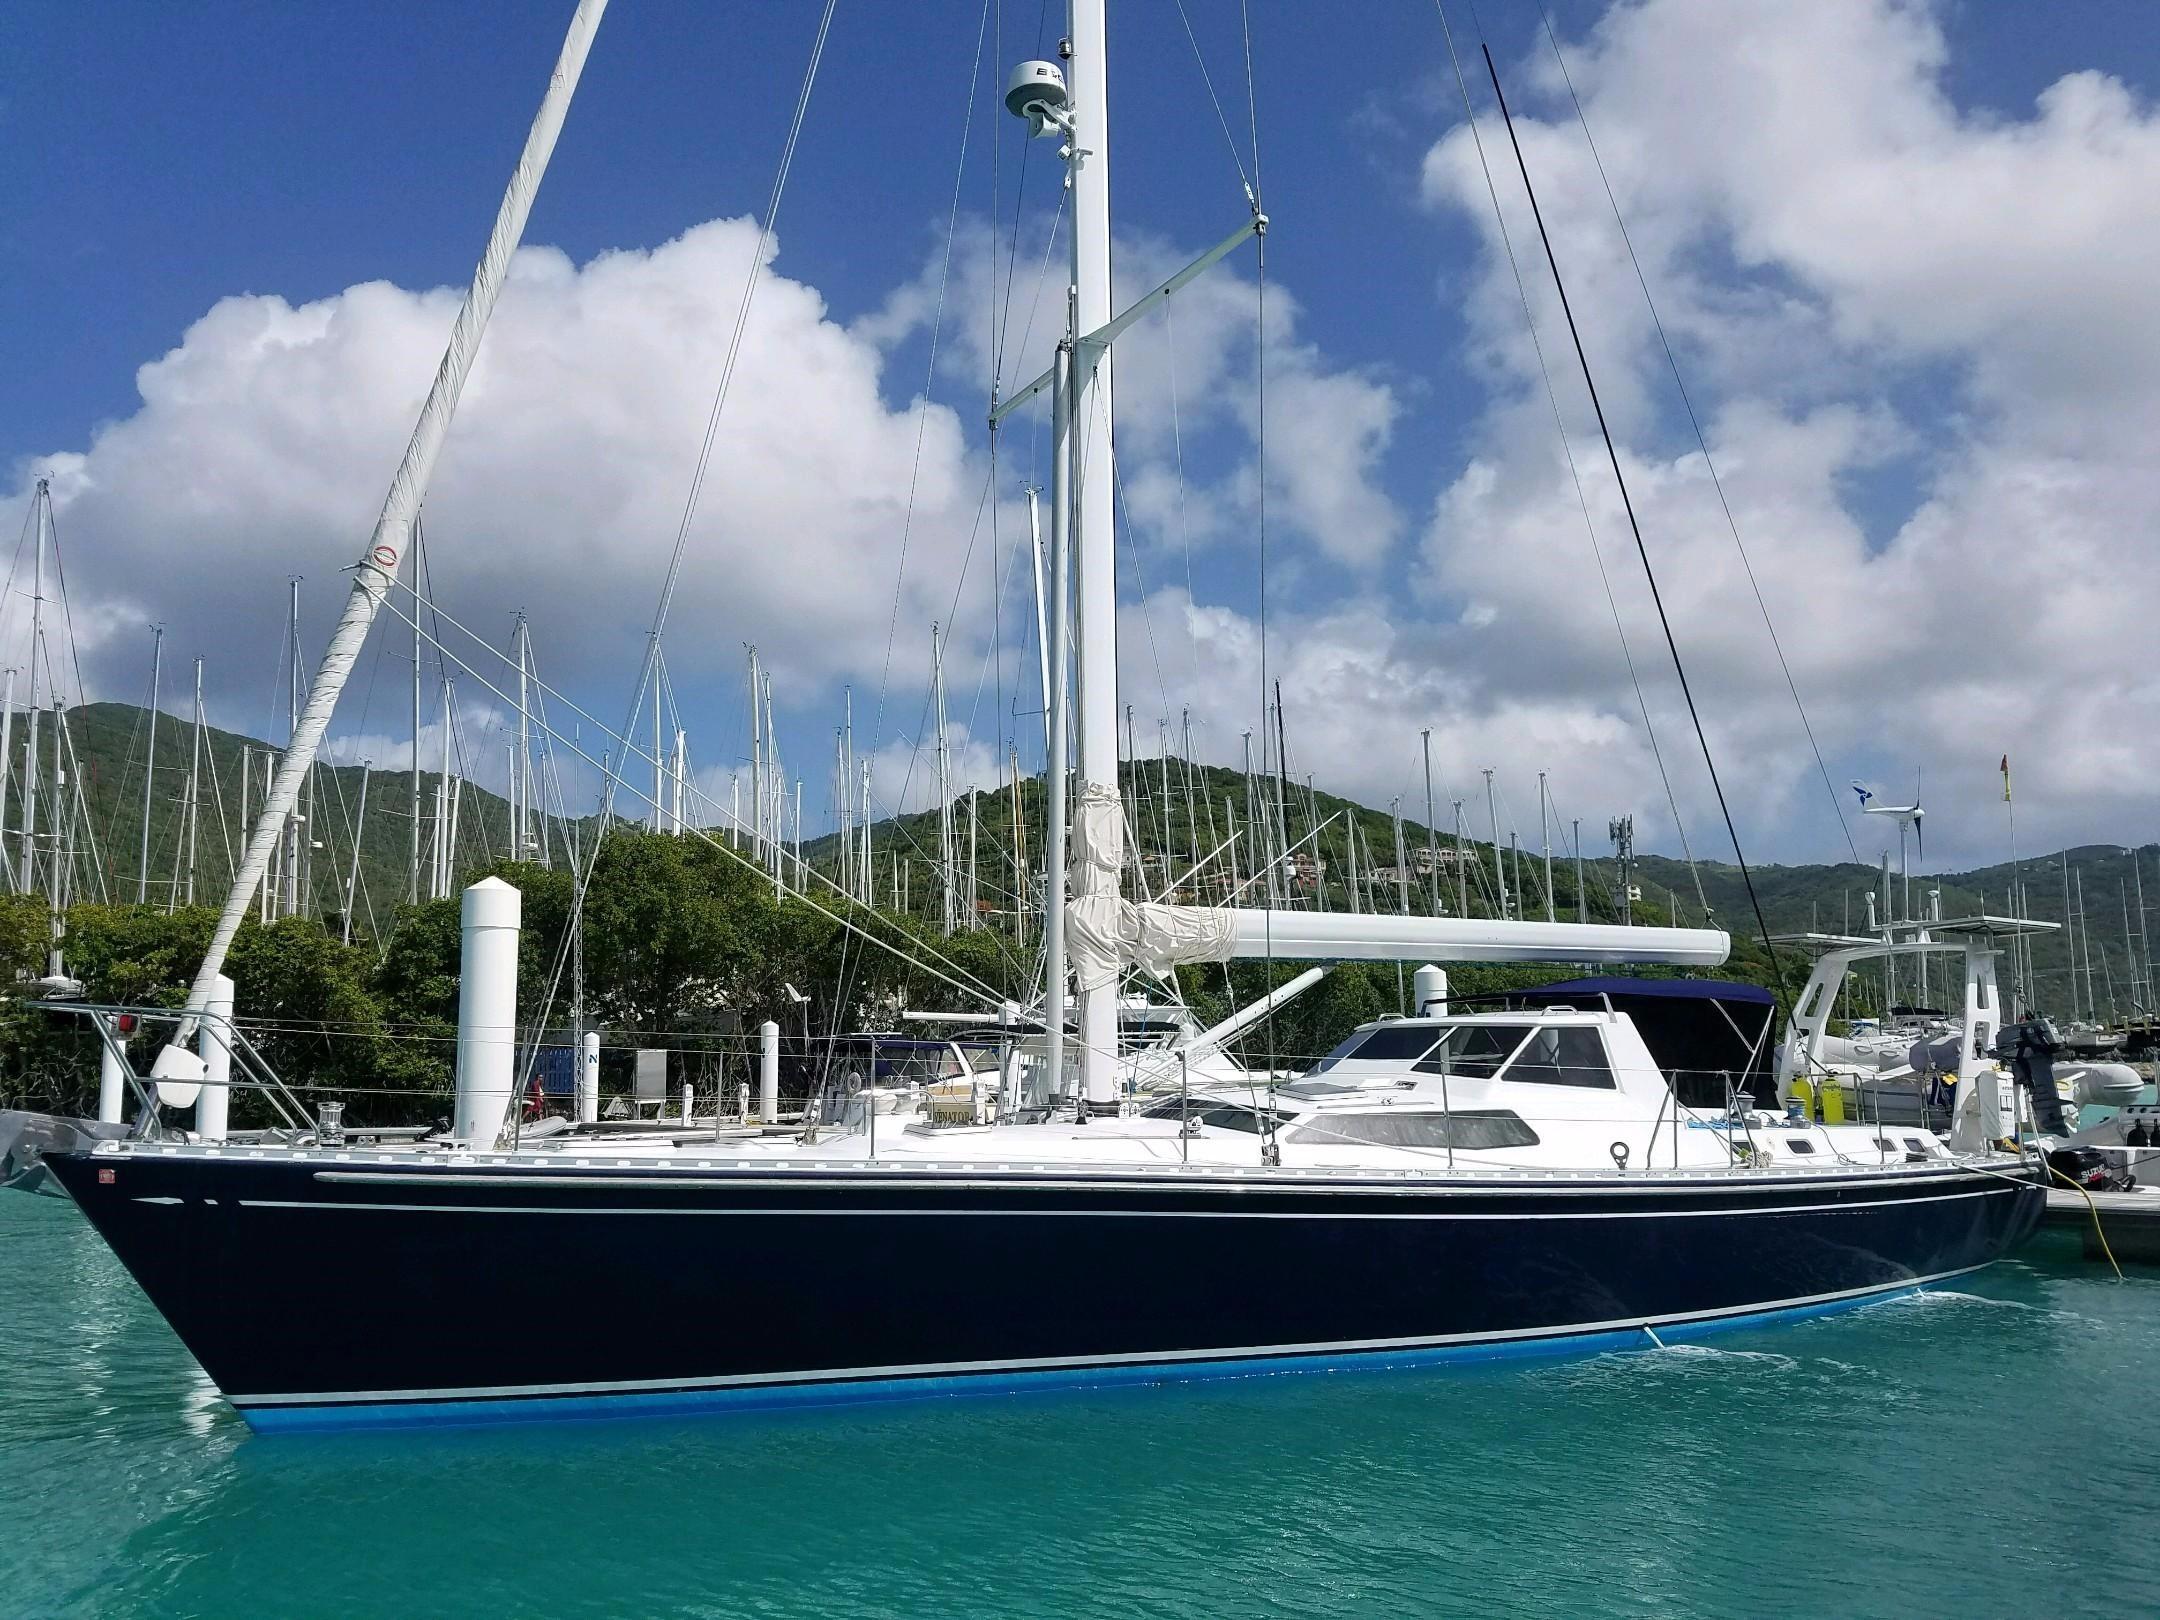 2001 islander 56 sail boat for sale www yachtworld com [ 2160 x 1620 Pixel ]